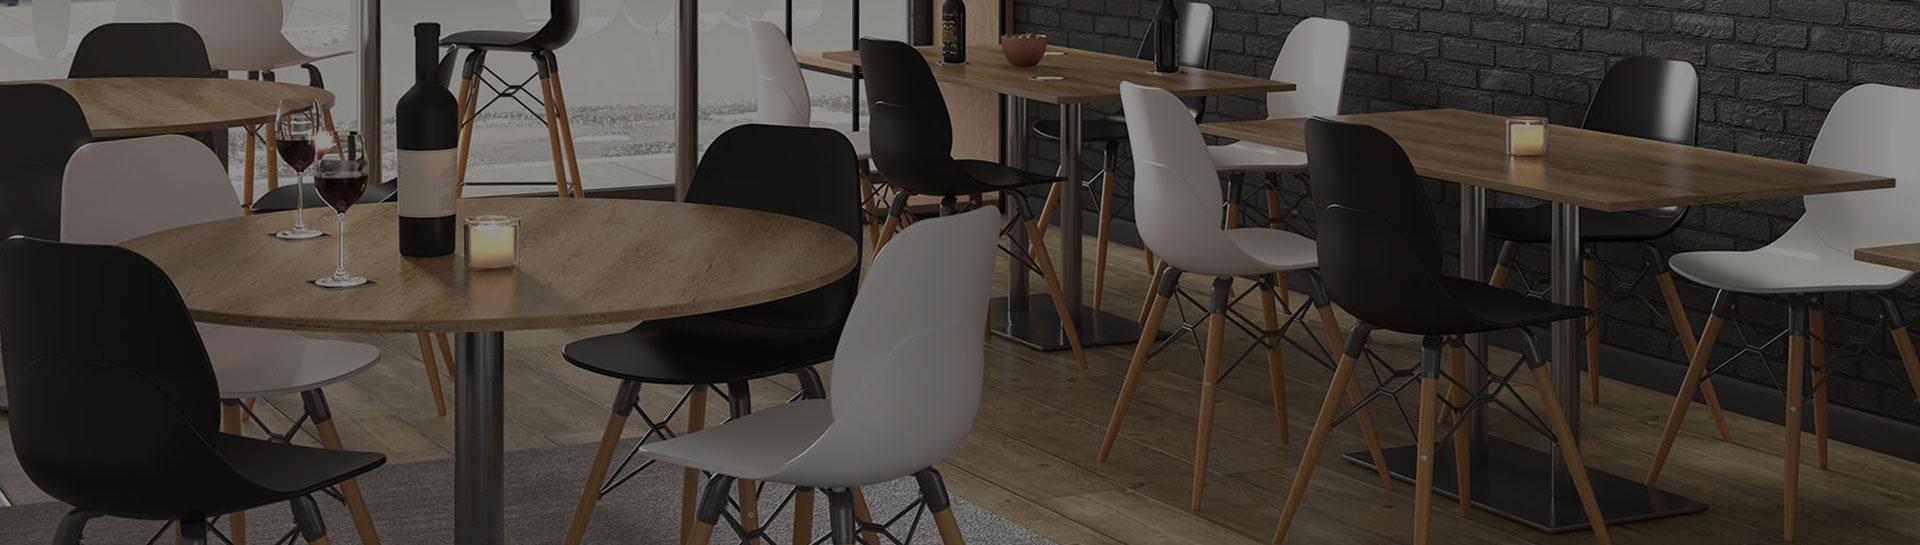 Cafe Furniture – Sunny overseas I Cafe Furniture Manufacturer In